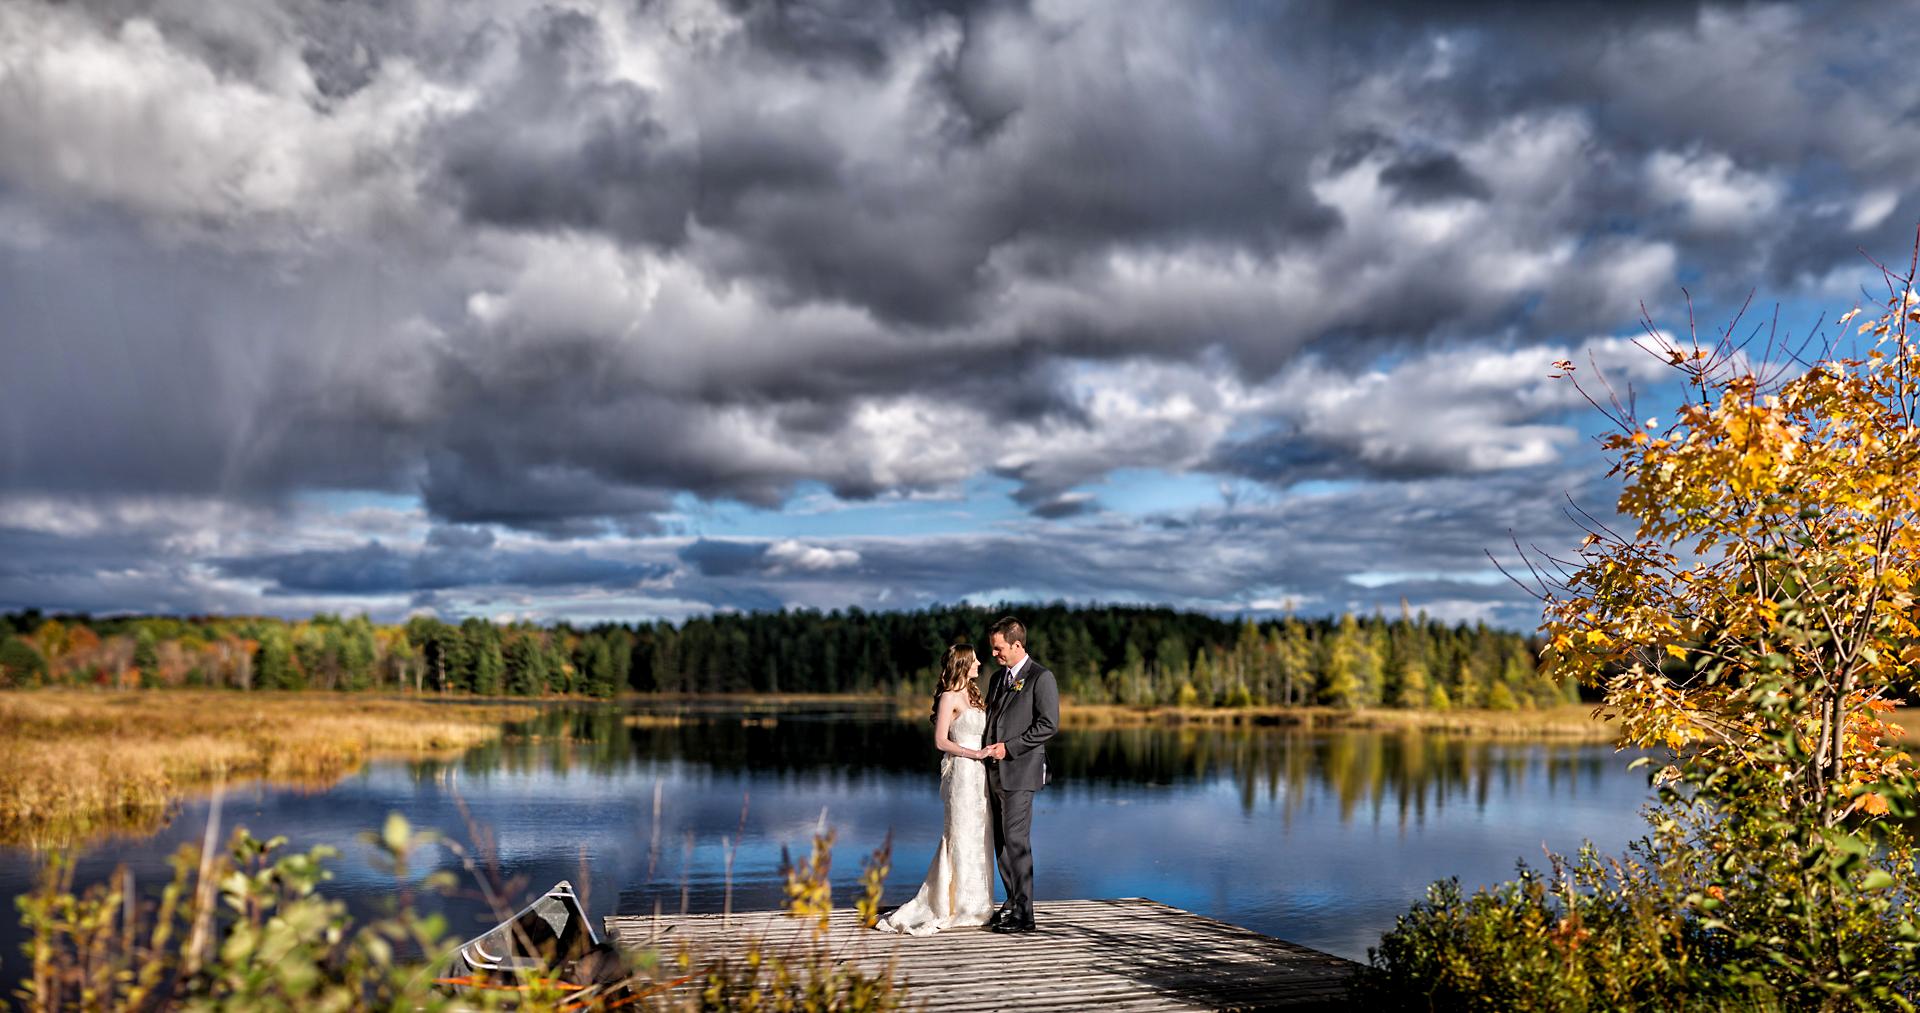 Nathan & Linda | Brooksfield Farms Wedding | Muskoka Wedding Photography01